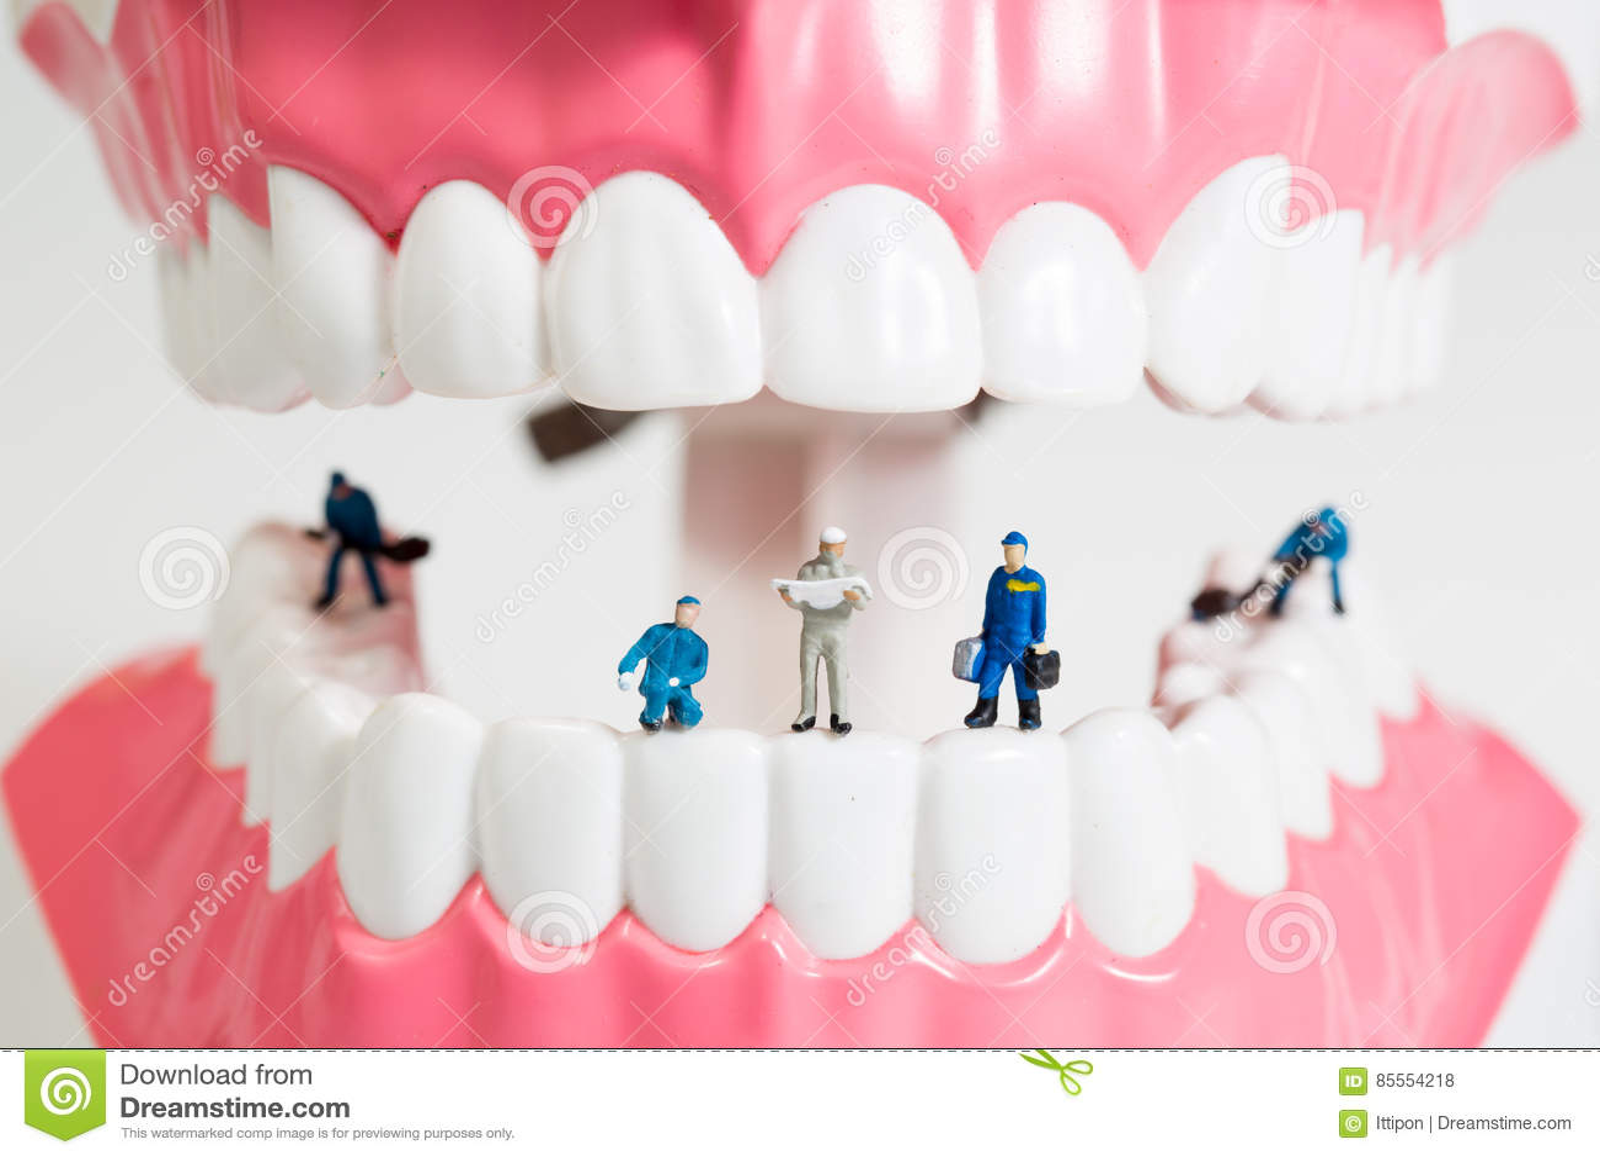 Miniaturleute zum Säubern von Zahnmodell